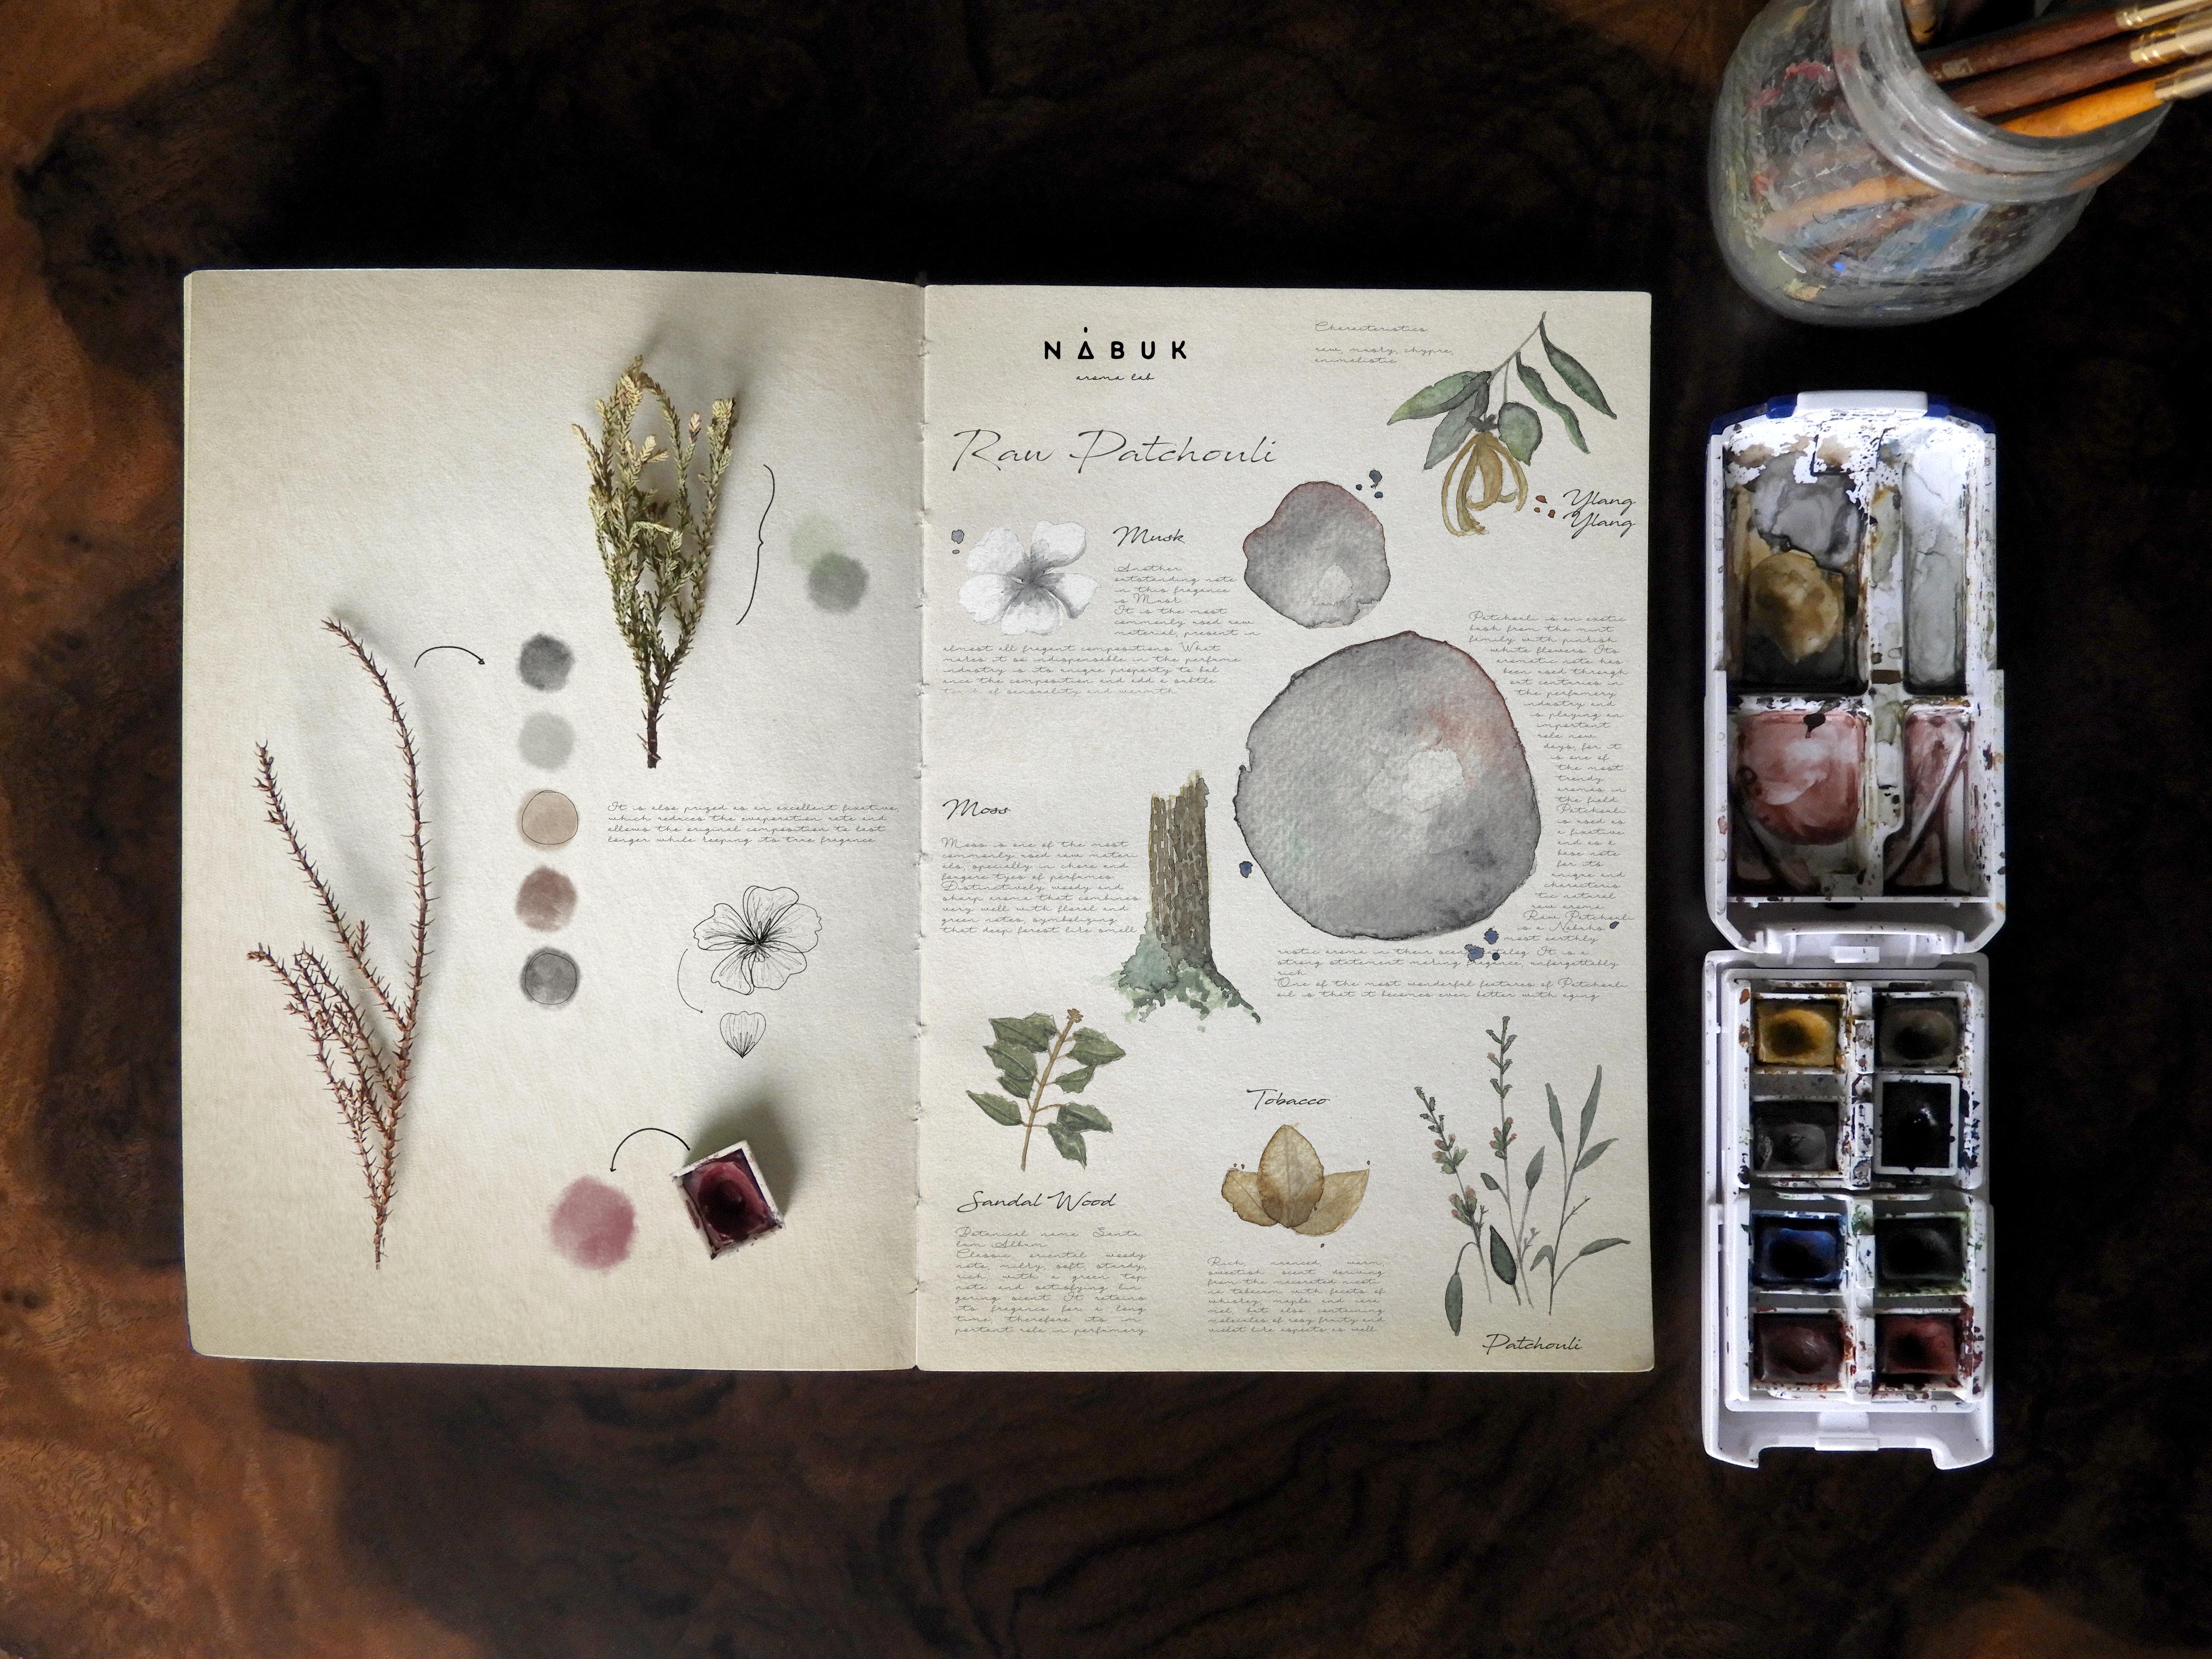 NABUK - Aroma Lab